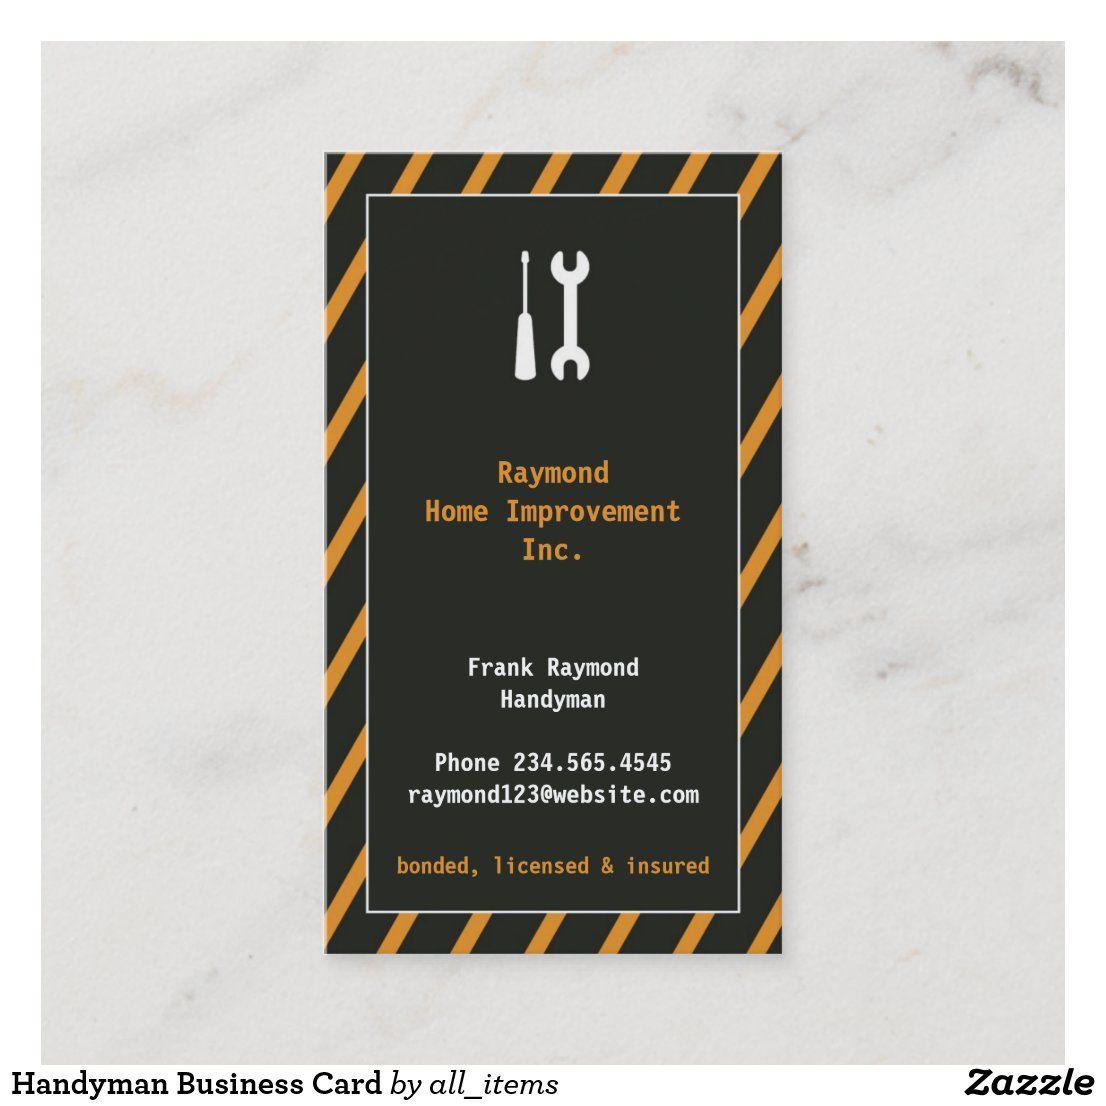 Handyman Business Card Zazzle Com Handyman Business Small Business Cards Elegant Business Cards